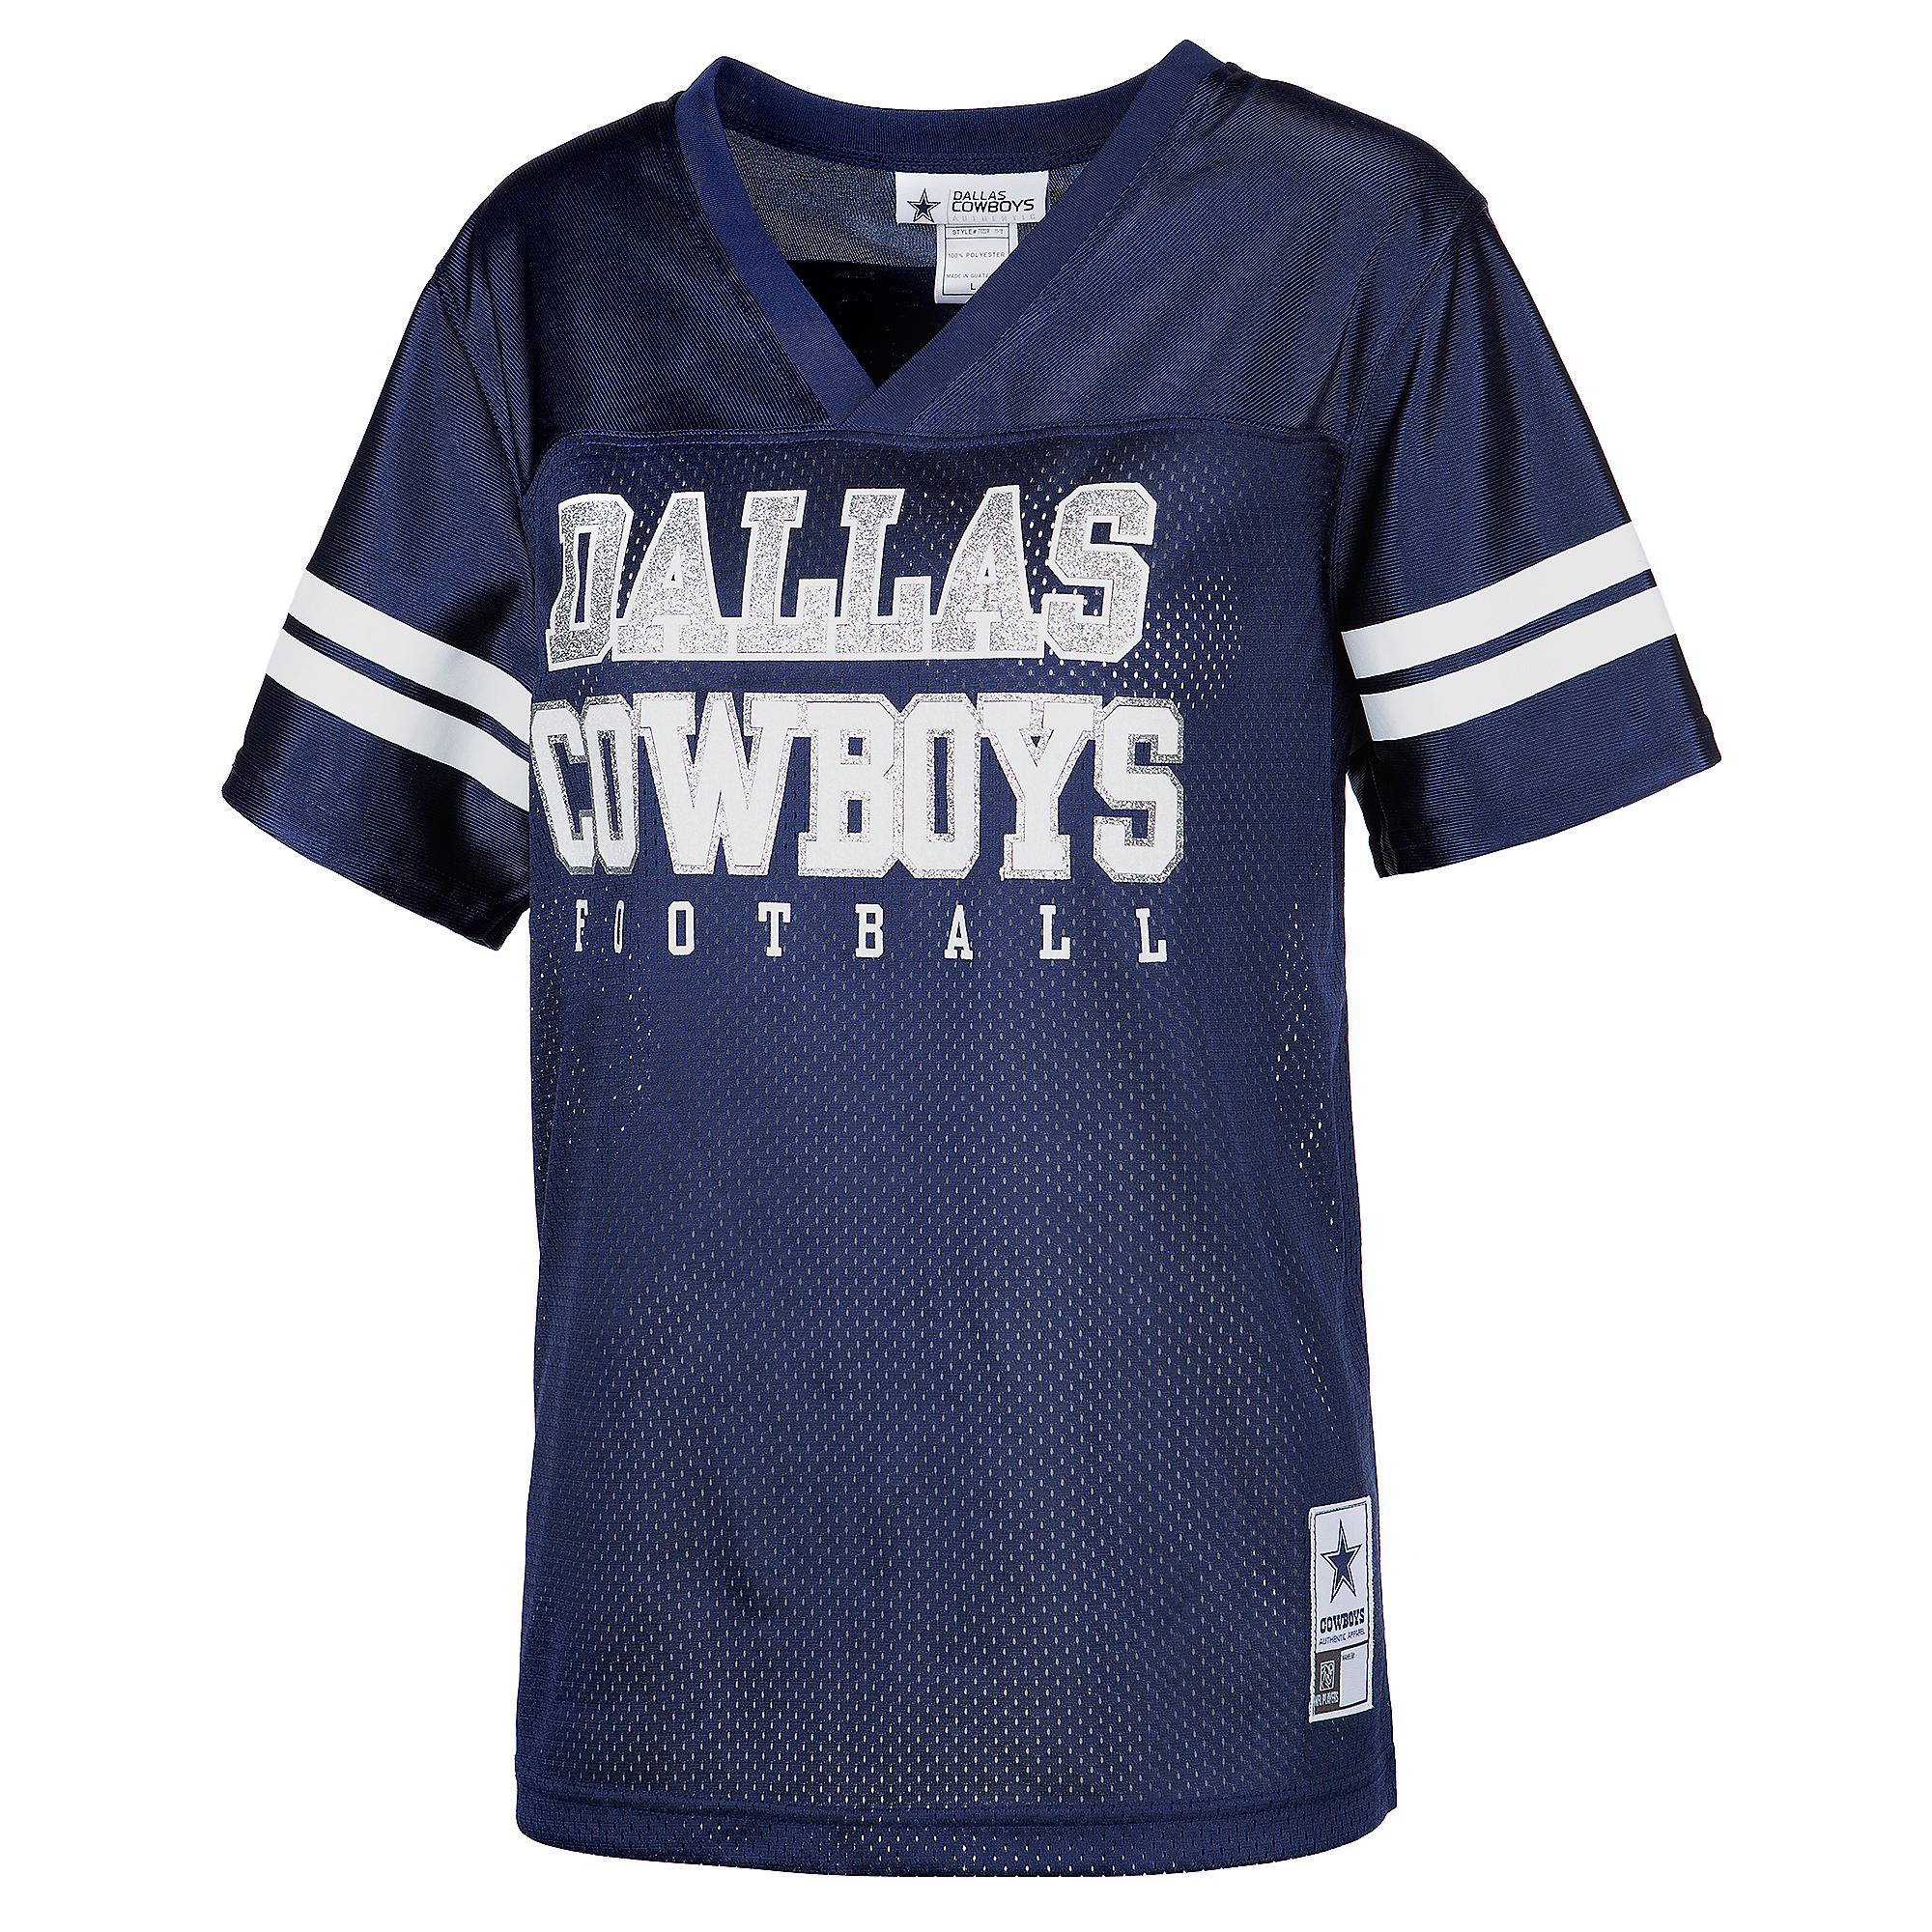 f53902f3 Dallas Cowboys Womens Custom Glitter Jersey | Dallas Cowboys Pro Shop